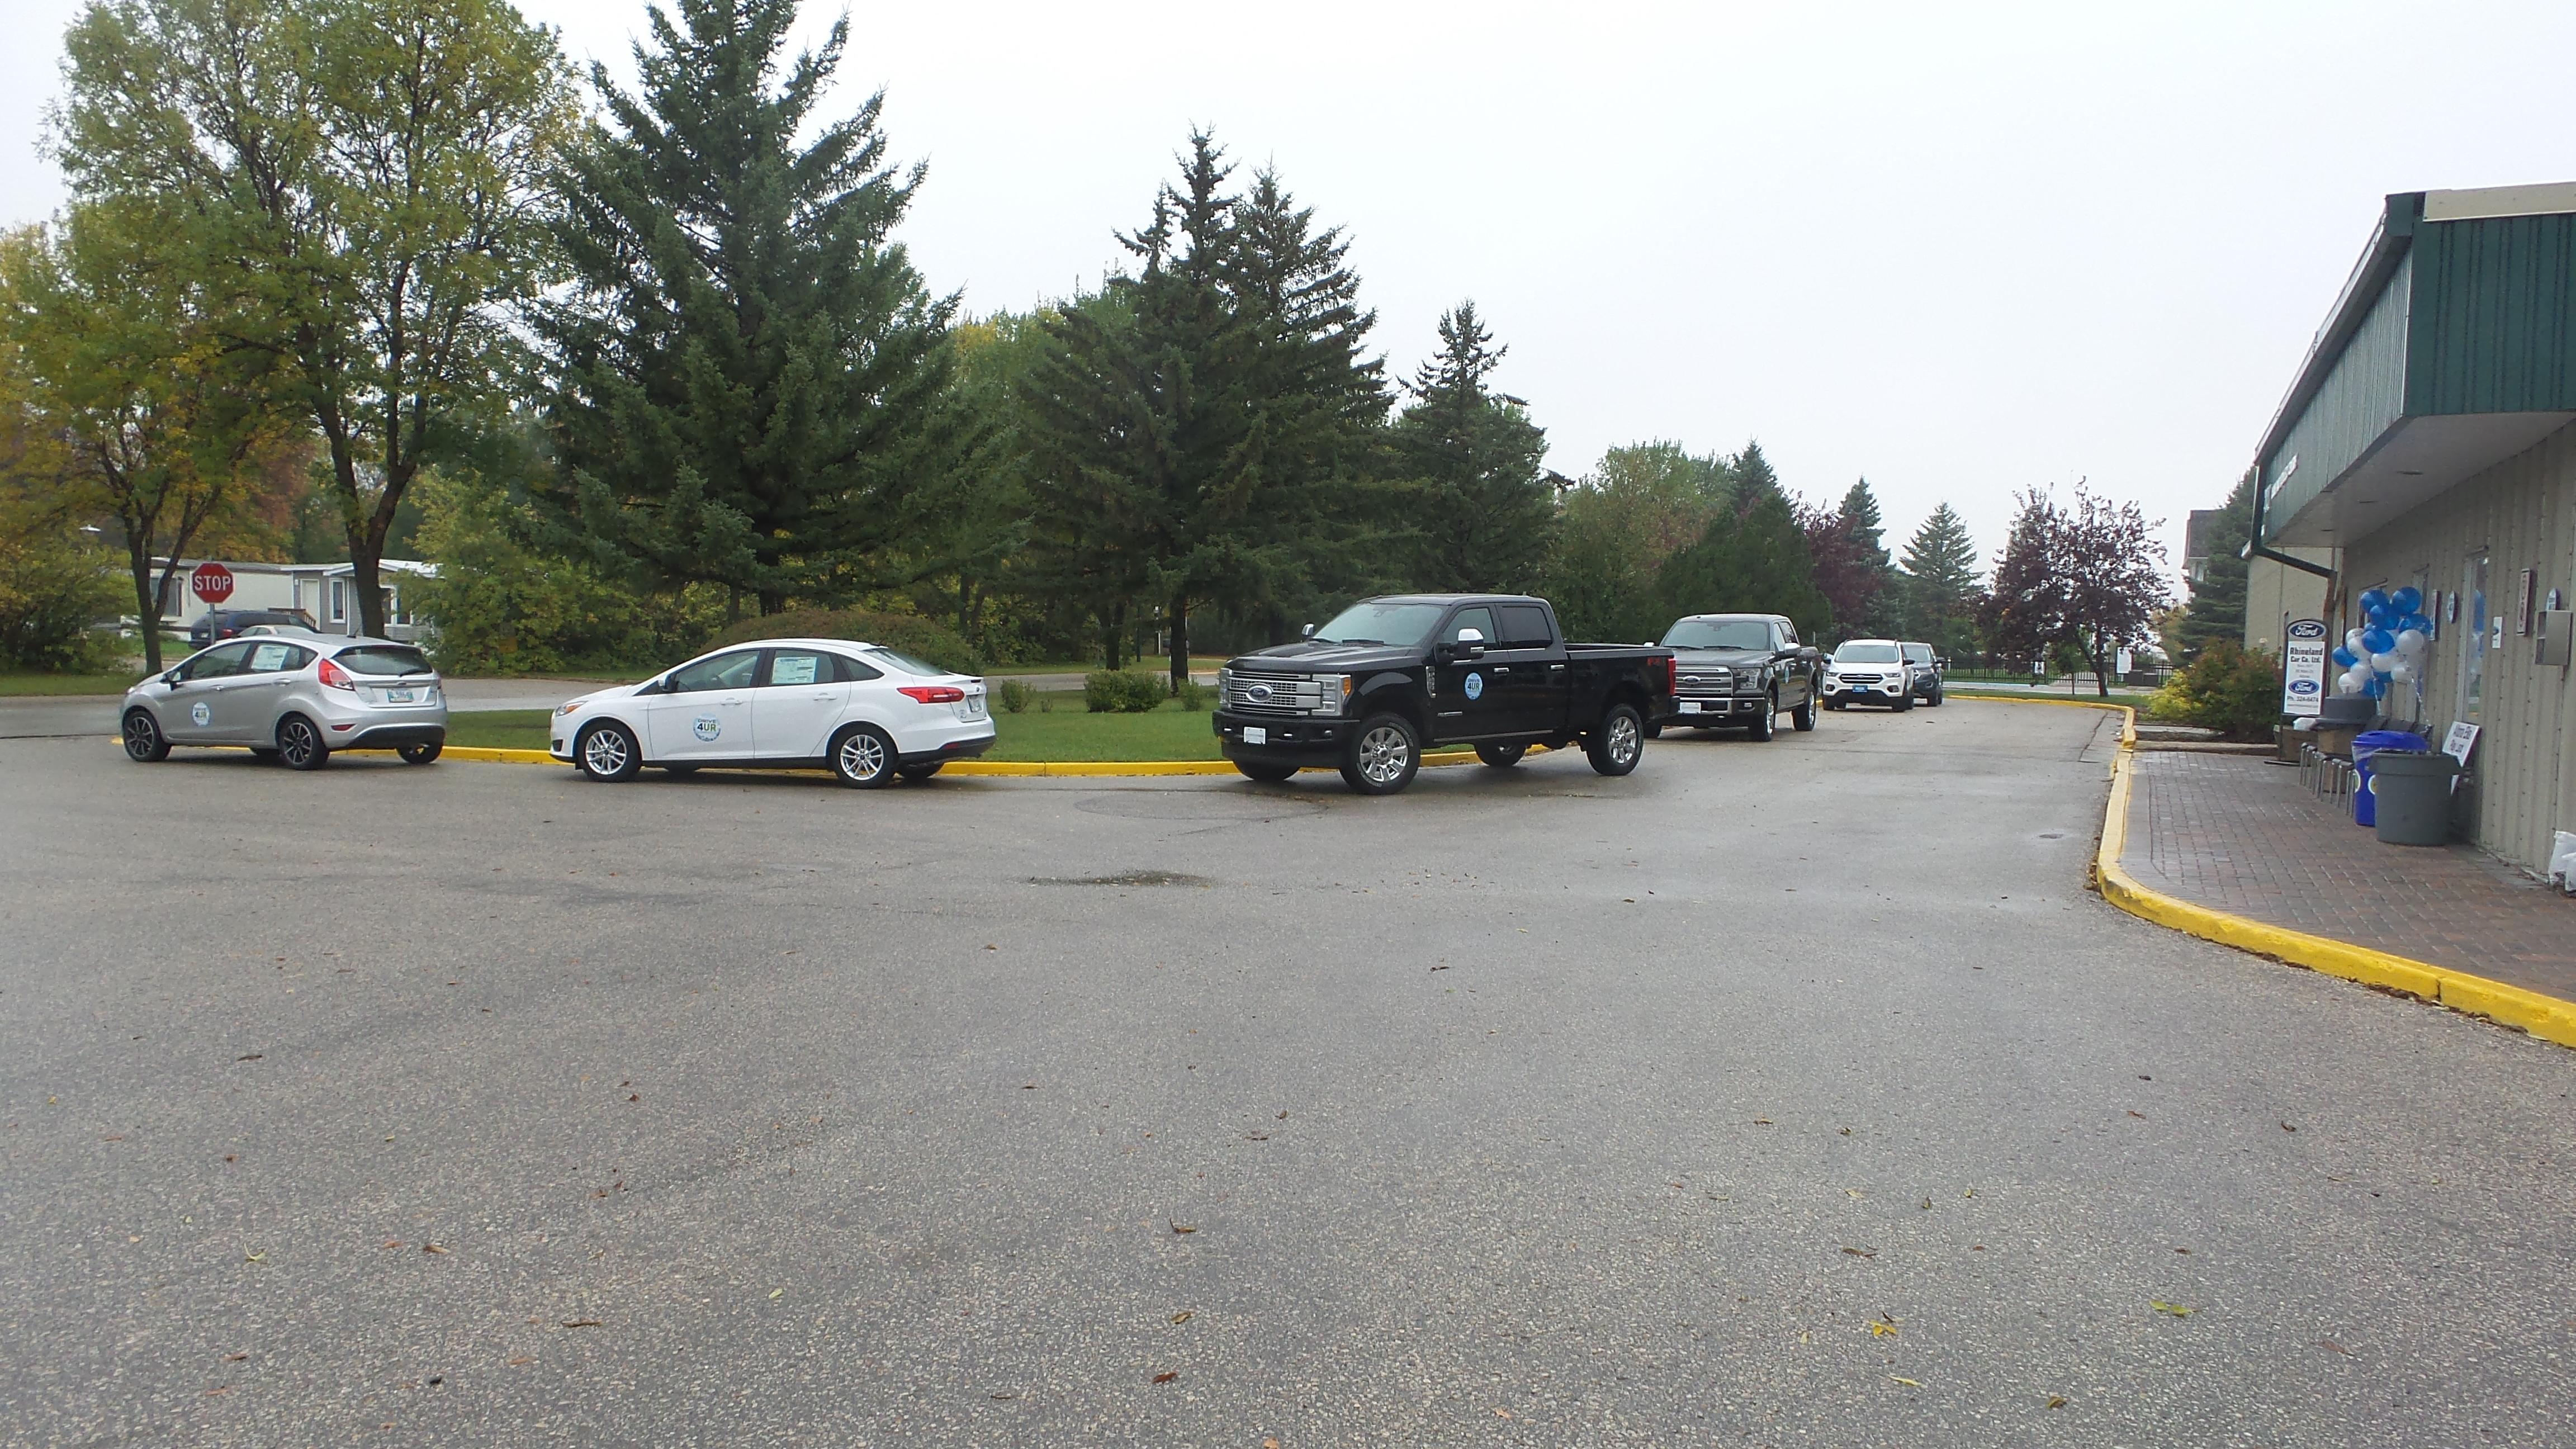 Ford Community Community image 1